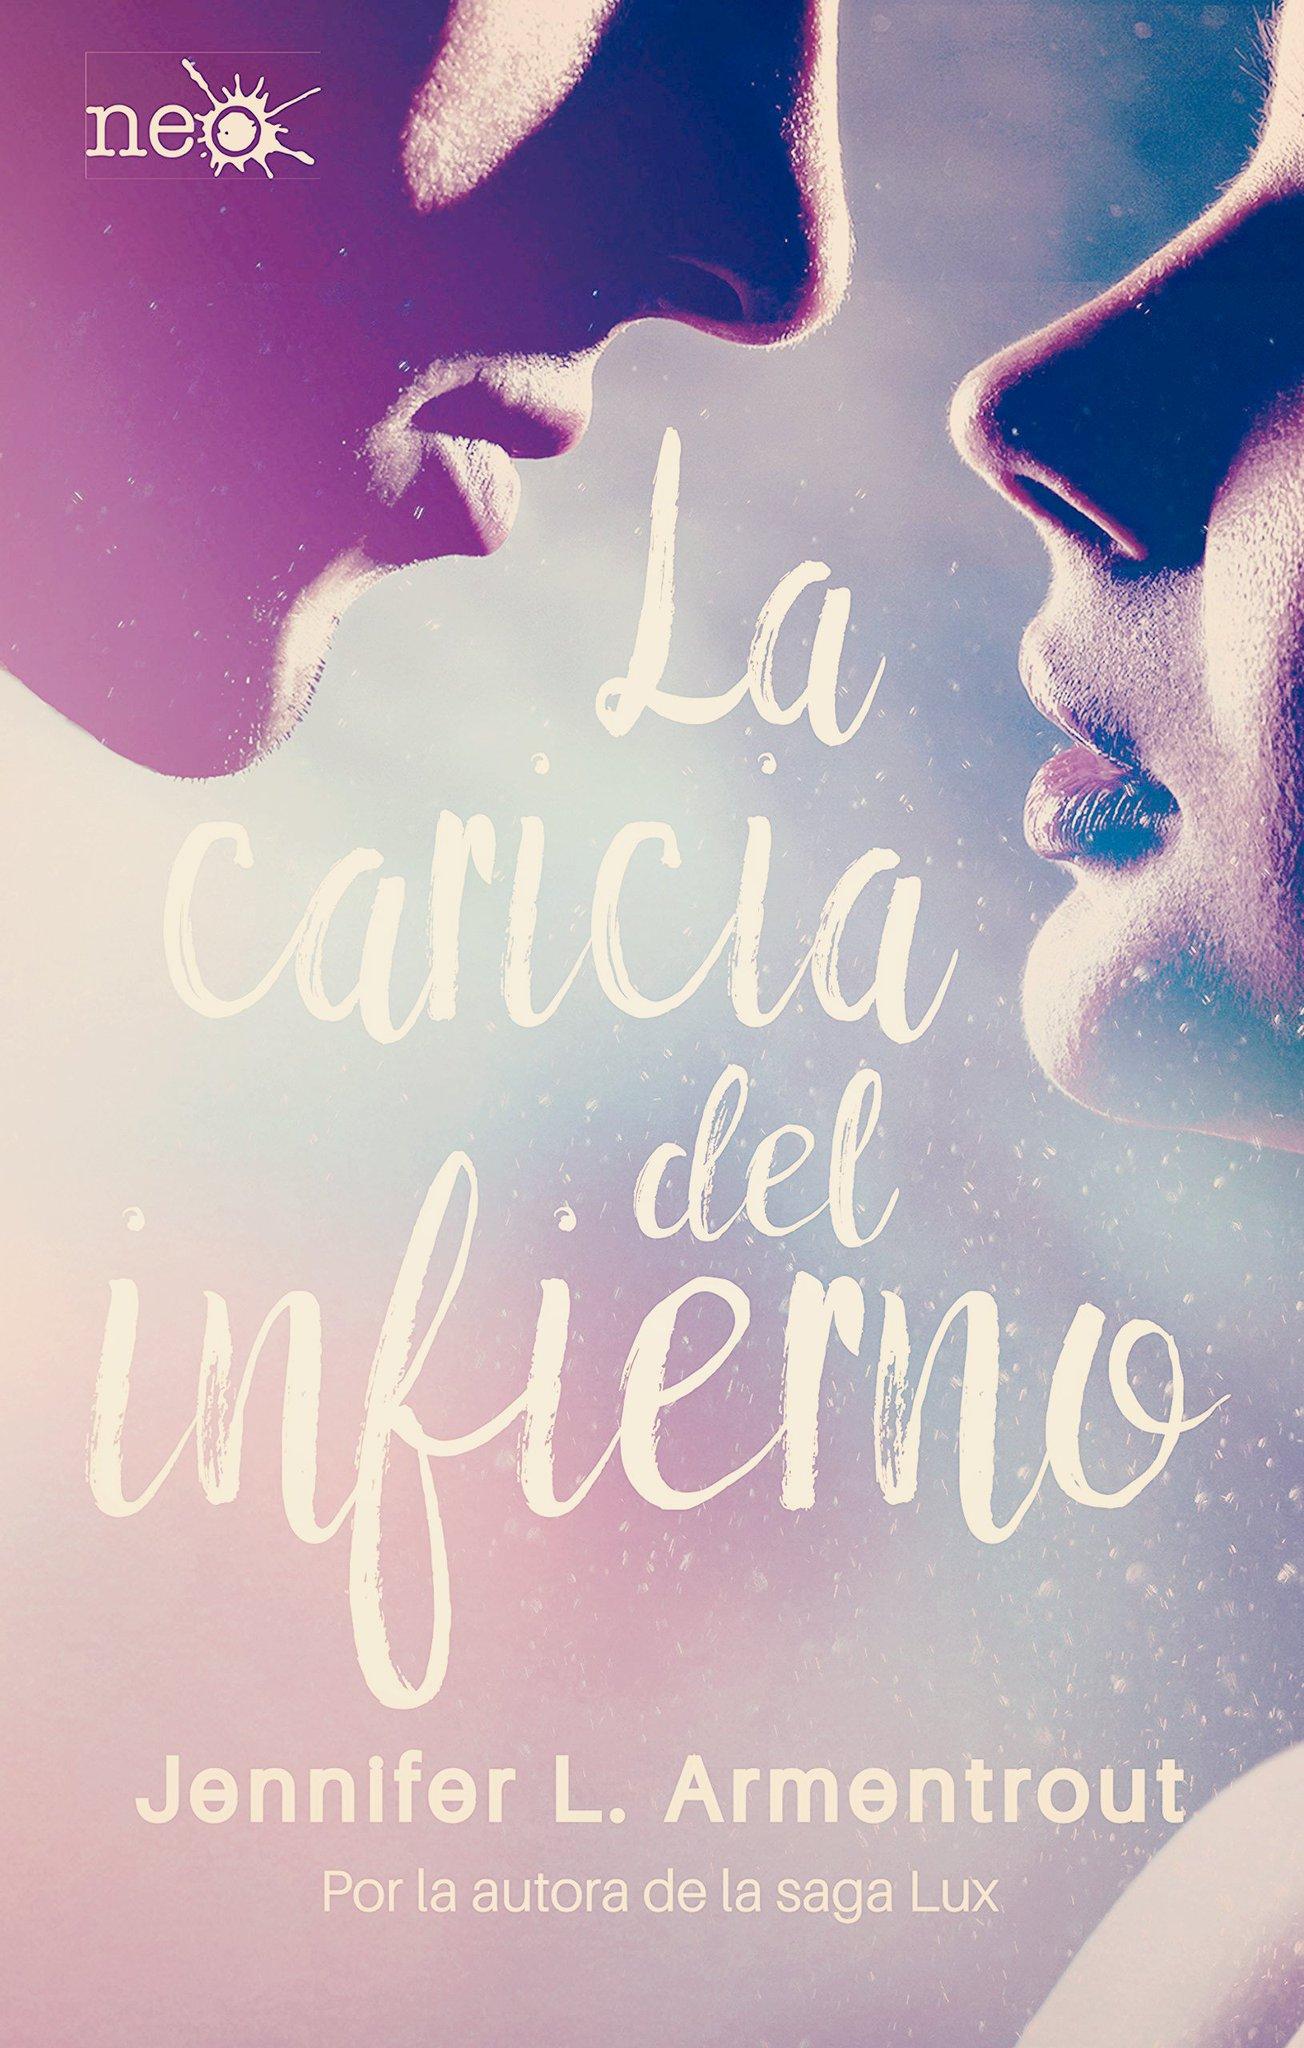 http://yourhappinesslife.blogspot.com/2017/08/resena-341-la-caricia-del-infierno.html